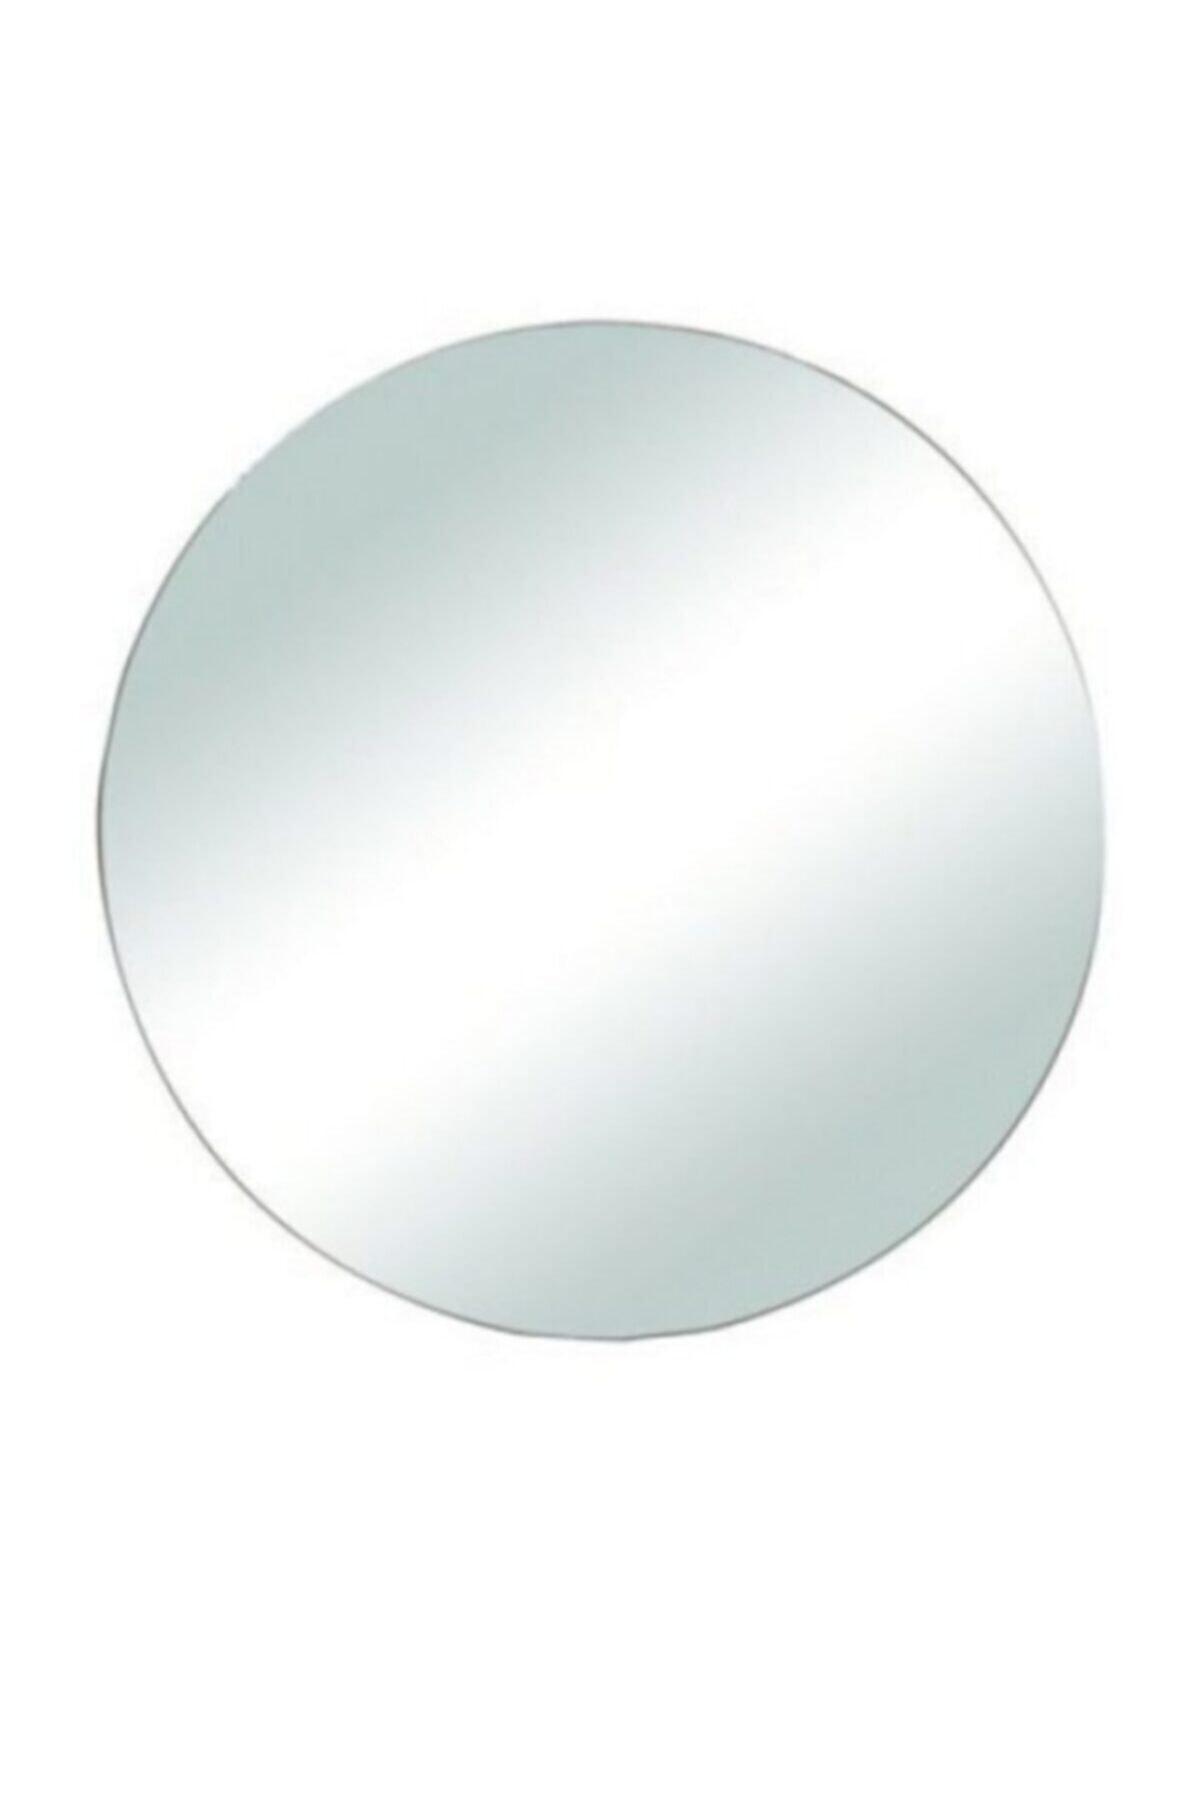 AKAN GRUP Yuvarlak Ayna 40 Cm 1